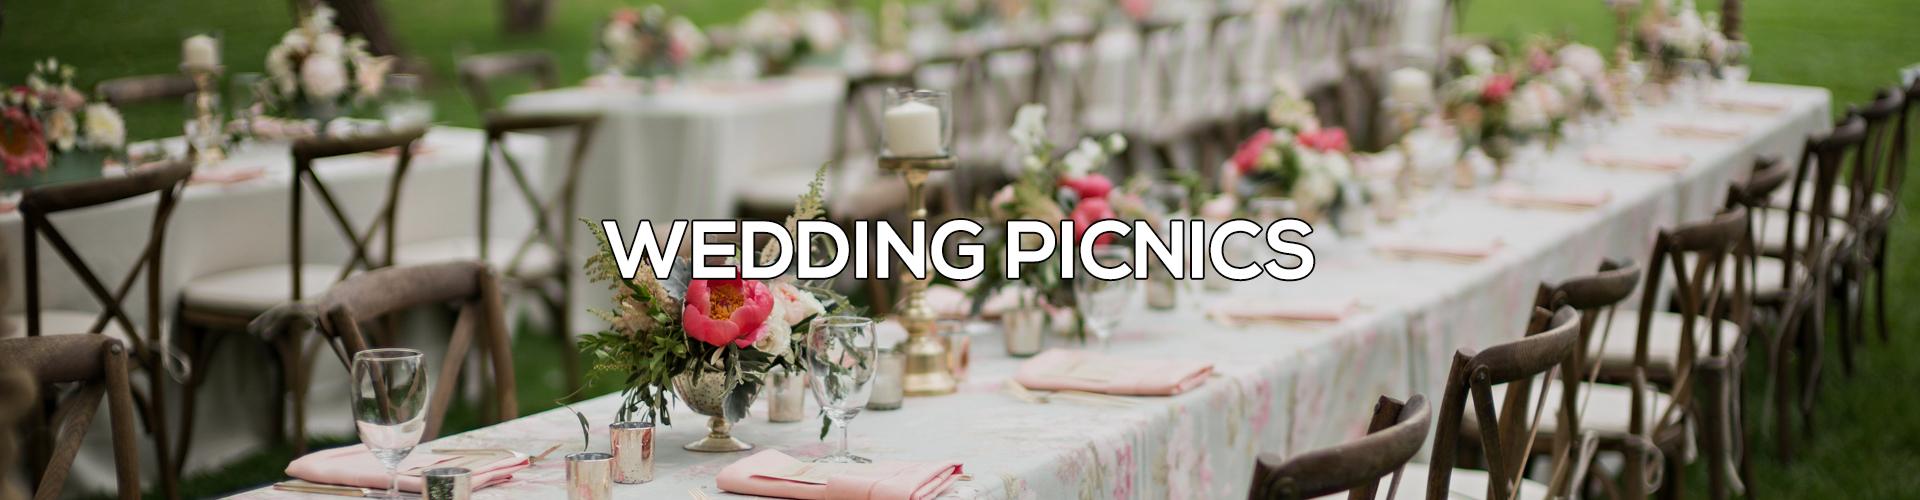 Wedding Picnics Little Picnic Company